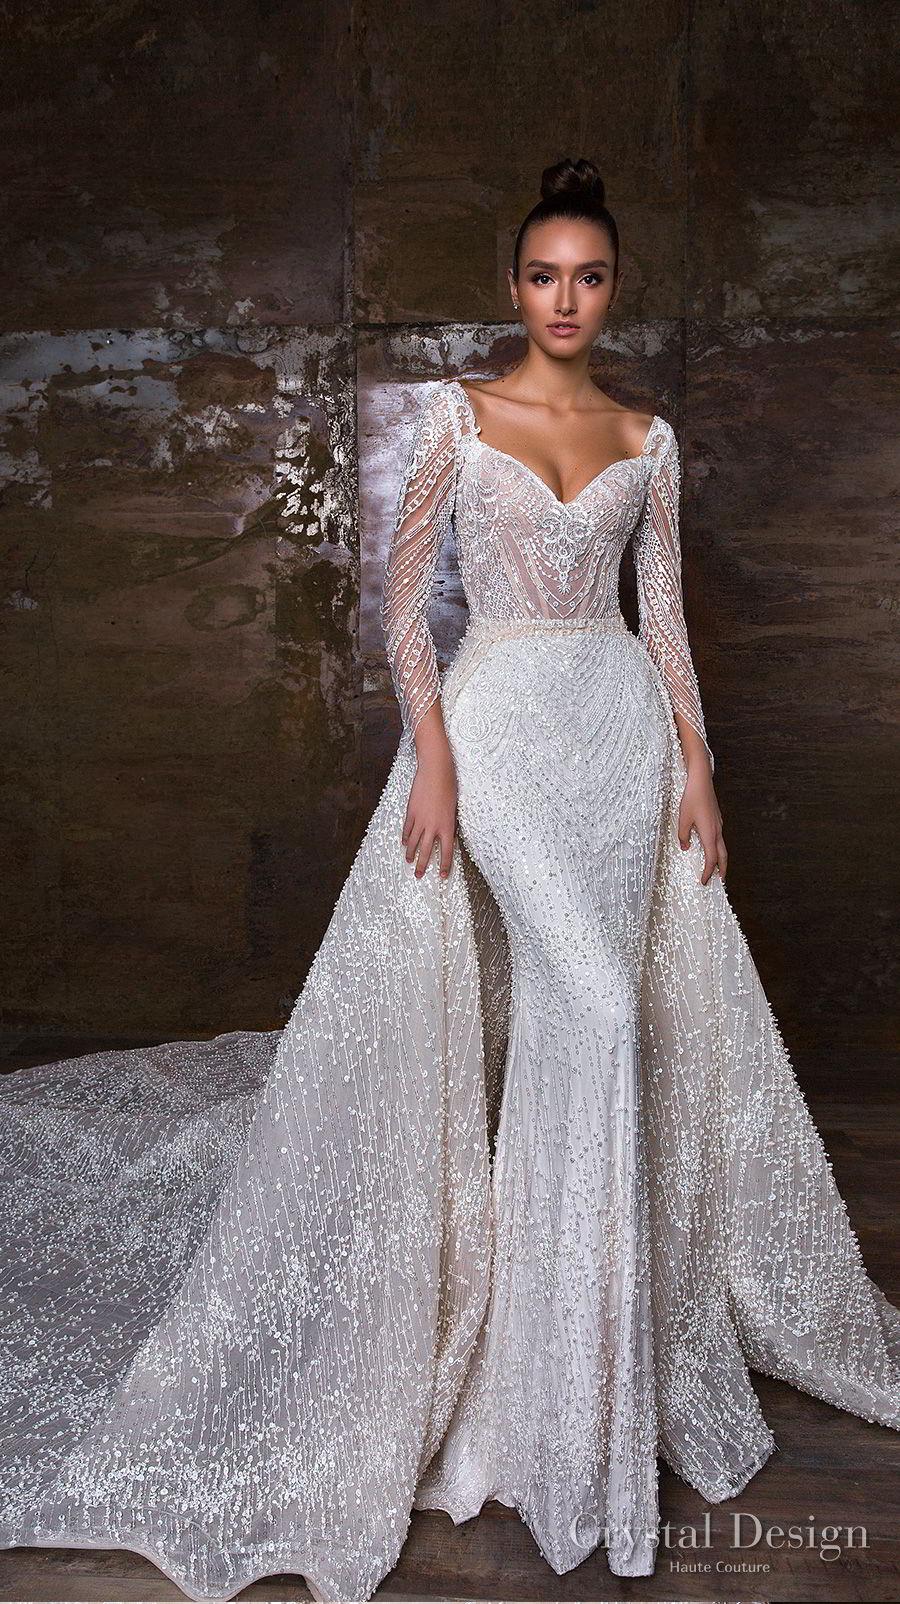 crystal design 2018 long sleeves sweetheart neckline full embellishment glamorous sheath wedding dress a line overskirt royal train (penelopa) mv